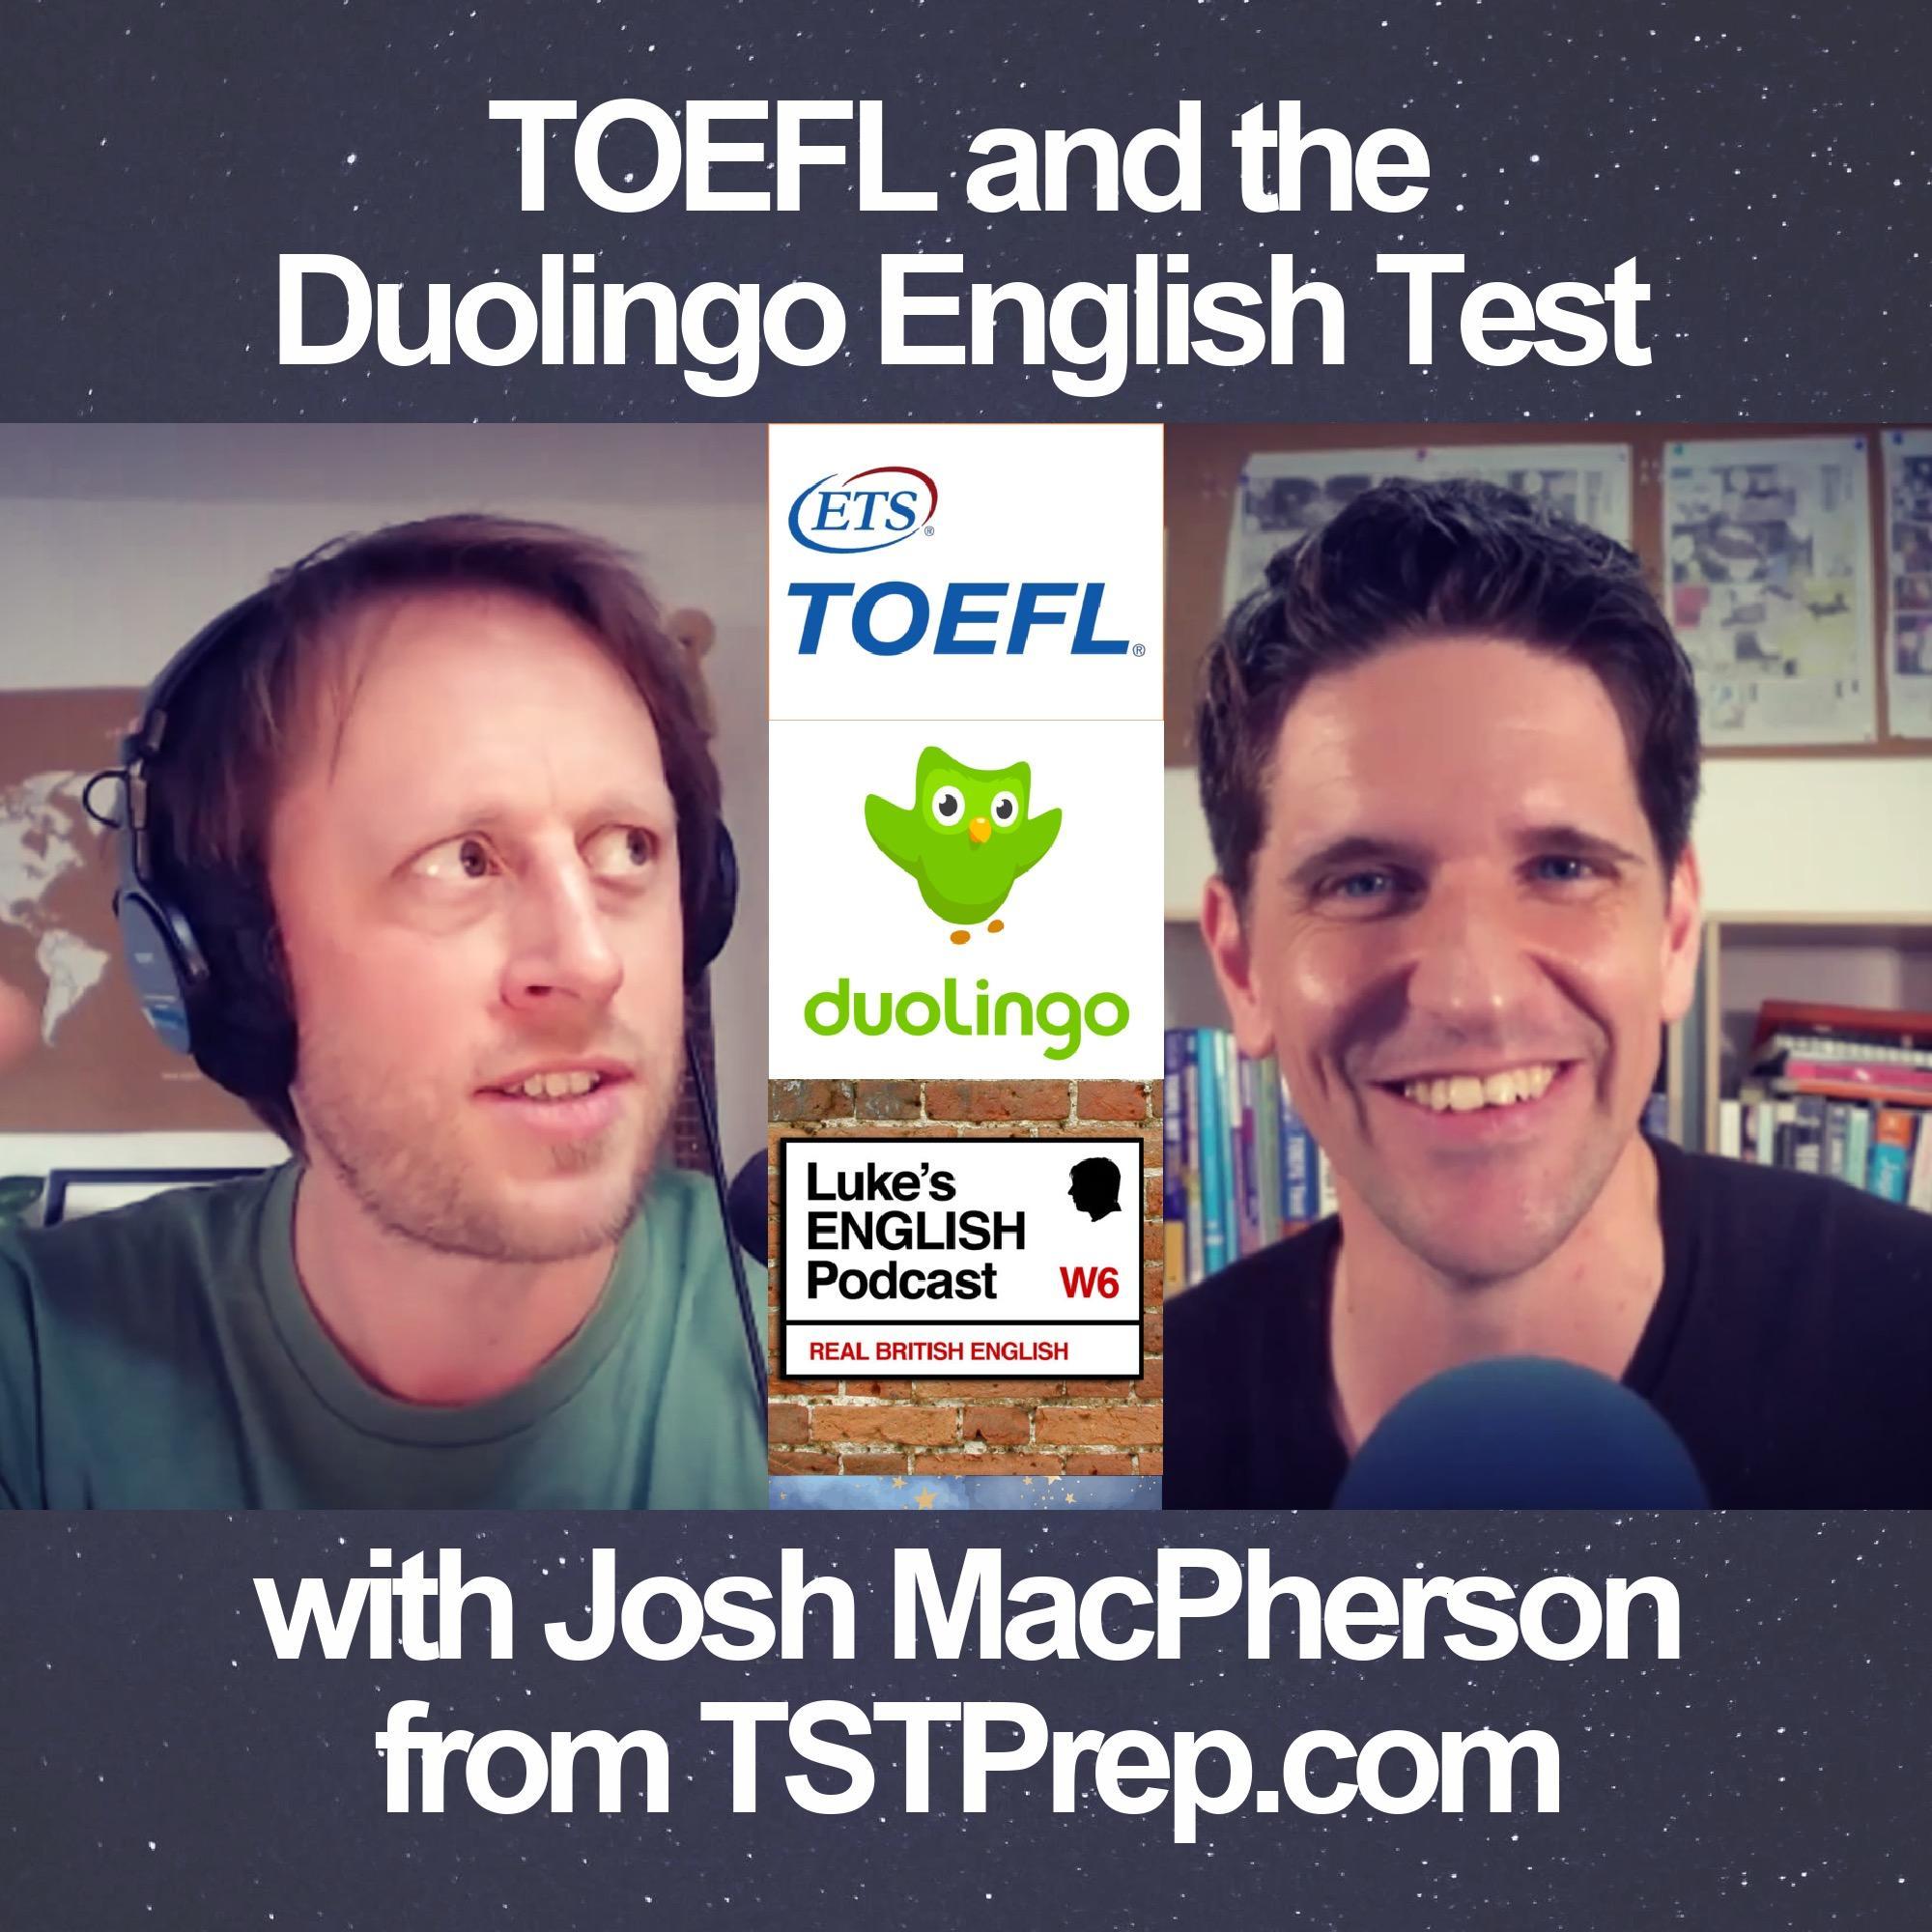 729. TOEFL and the Duolingo English Test (with Josh MacPherson from TSTPrep.com)